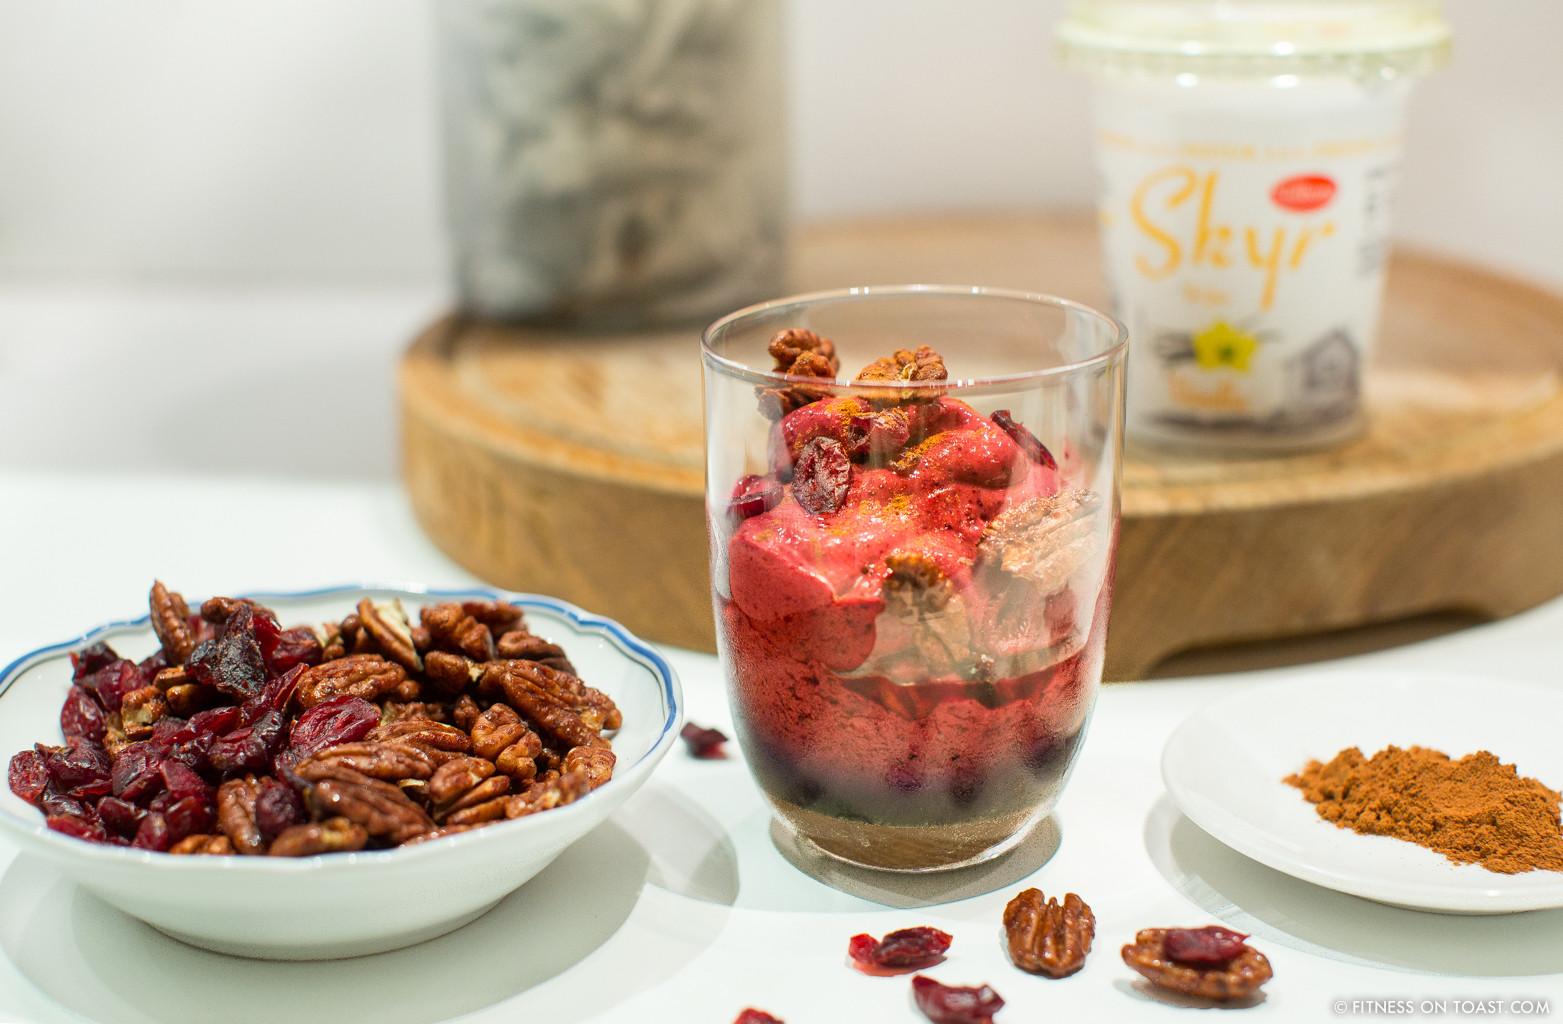 Healthy Tasty Desserts  Festive Scandi Skyr Yoghurt Dessert Recipe Christmas Xmas